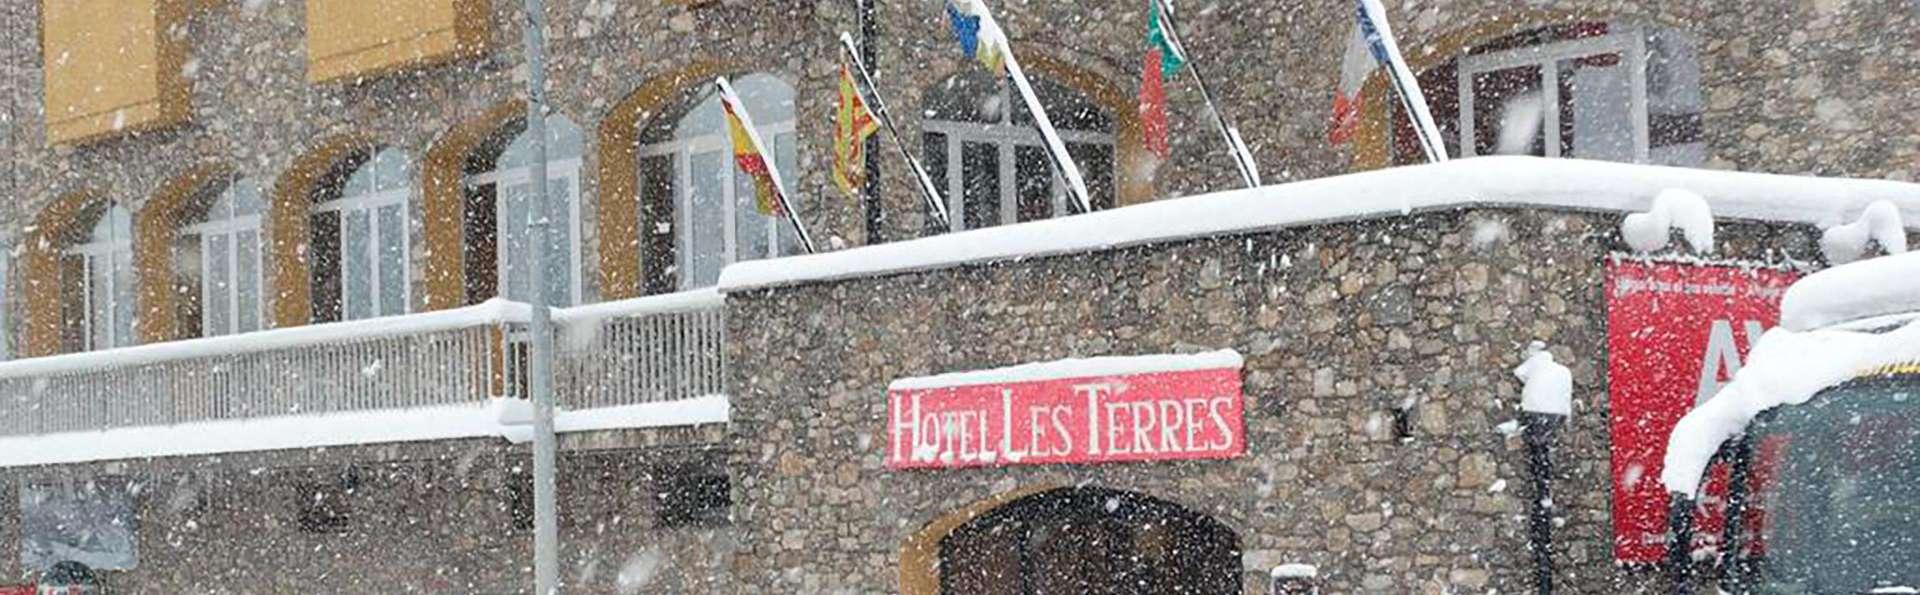 Hotel Les Terres - EDIT_FRONT_02.jpg